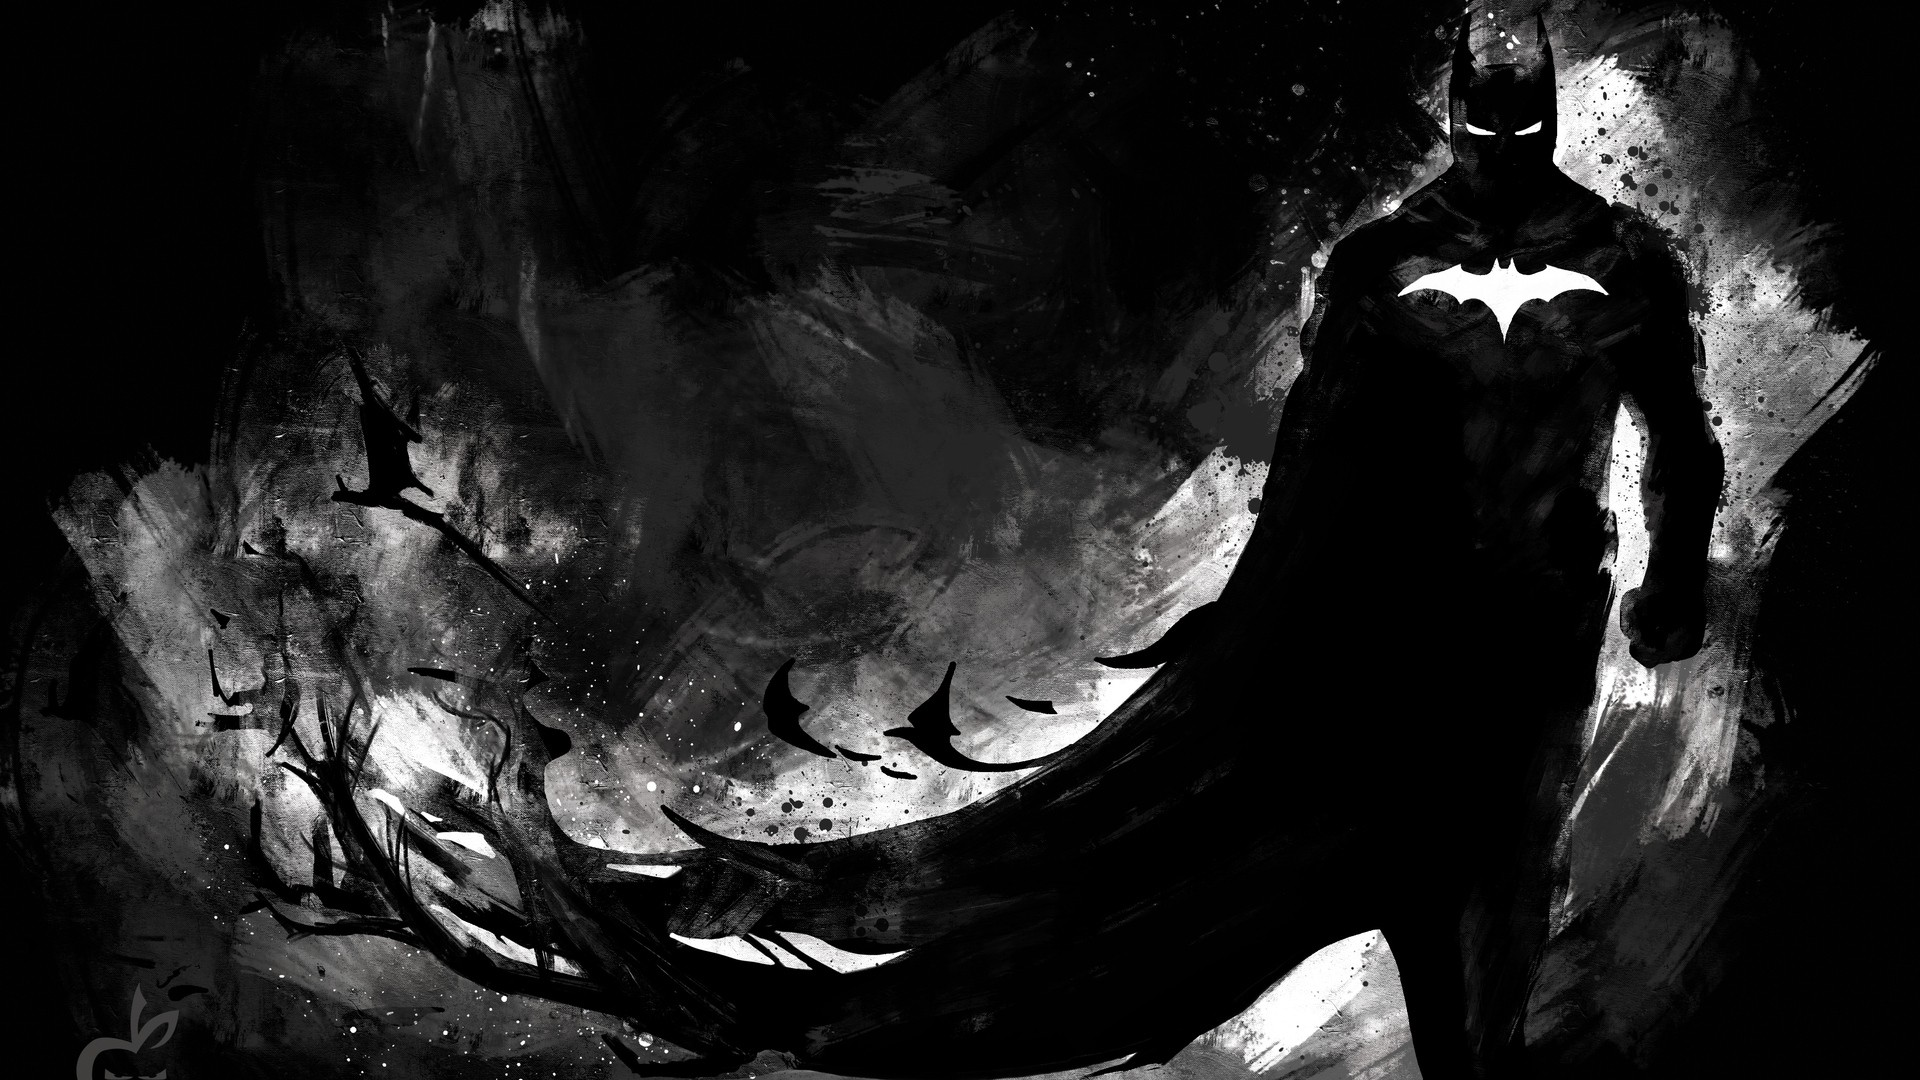 Batman Art Image